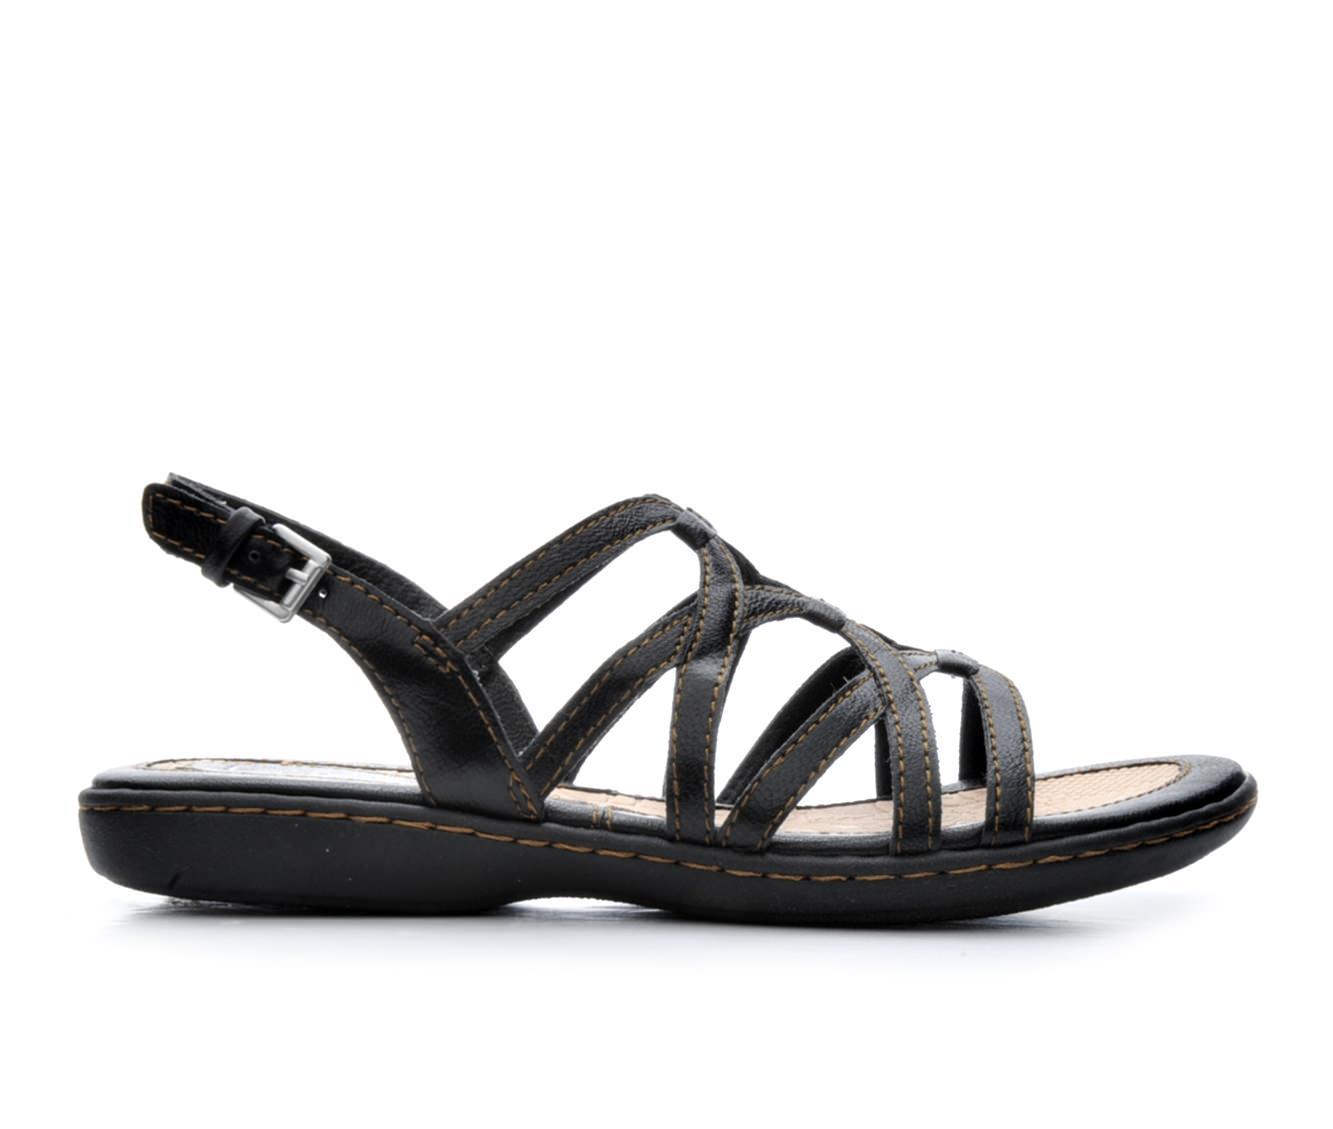 Women's B.O.C. Cora Sandals (Black)